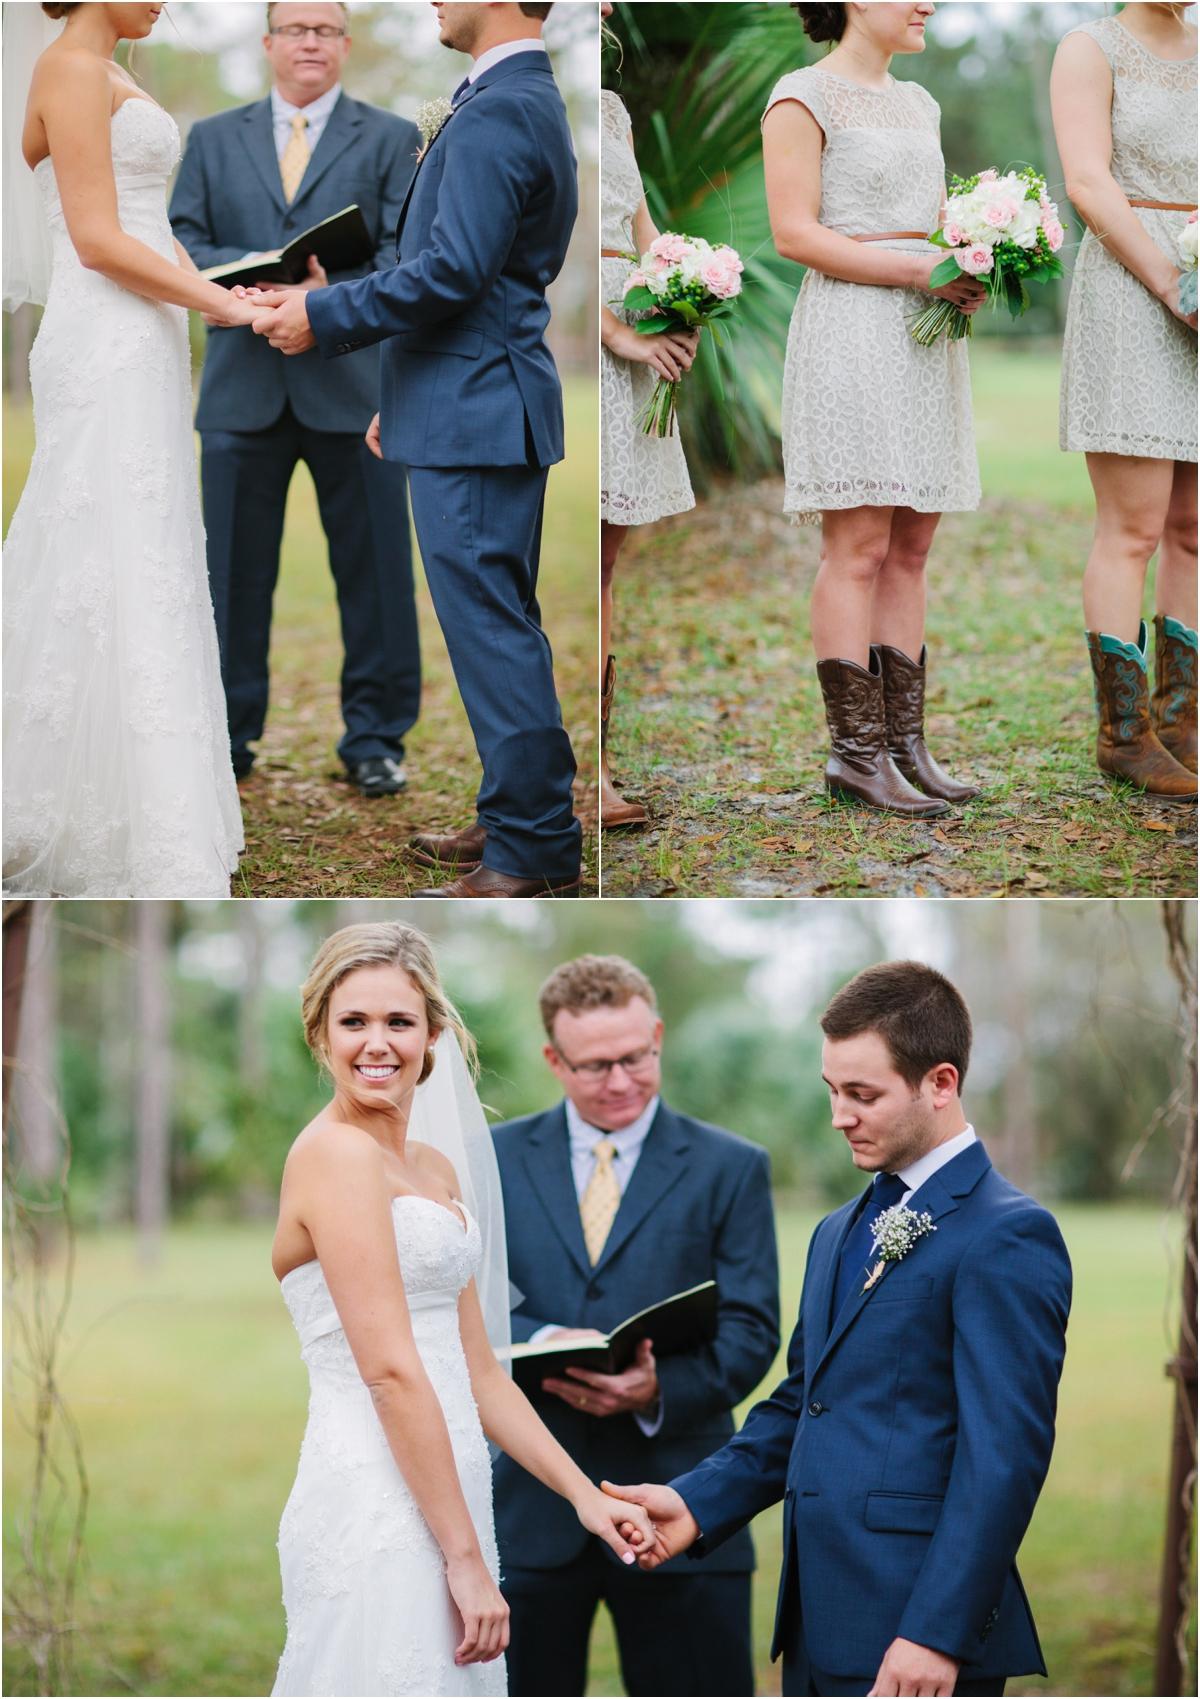 South_Florida_Wedding_Southern_Palm_0012